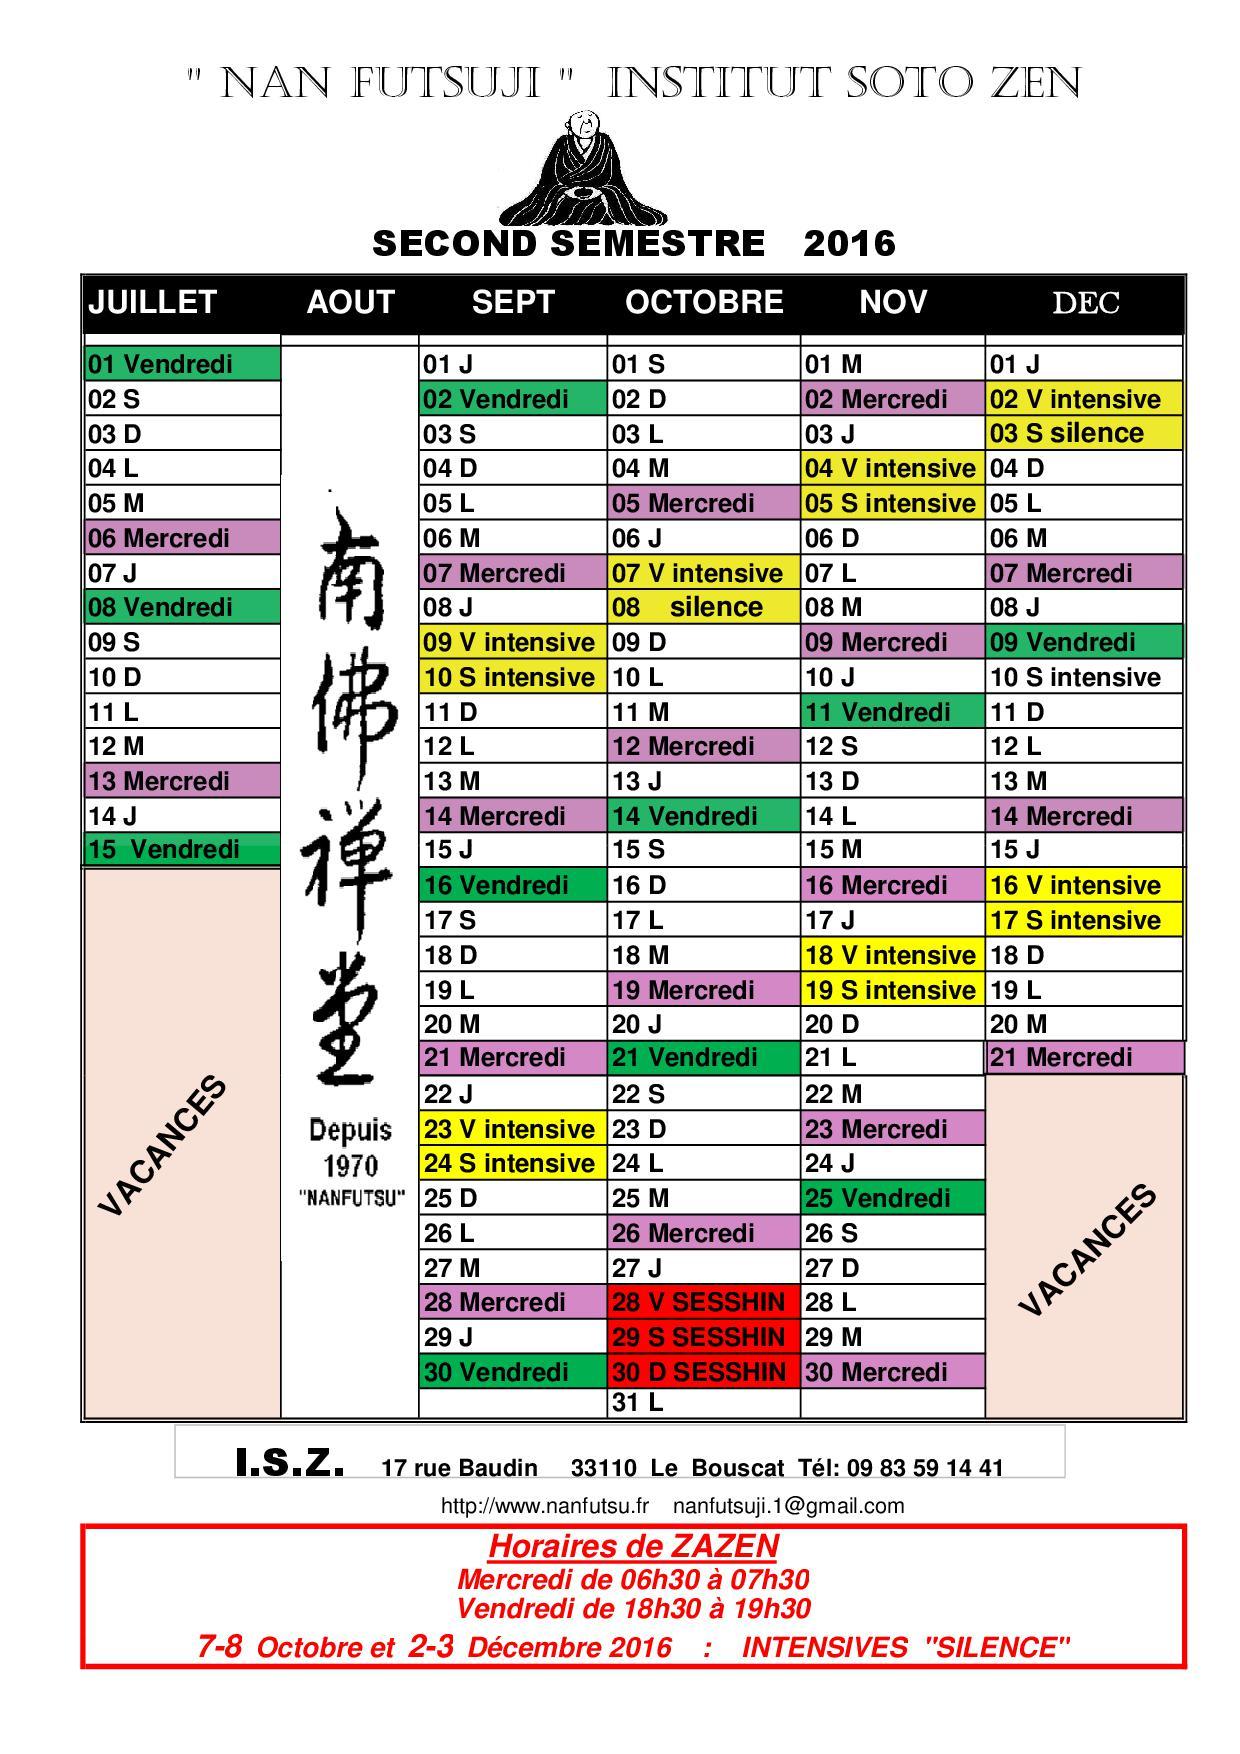 C users philou desktop calendrier 2eme sem 2016 1